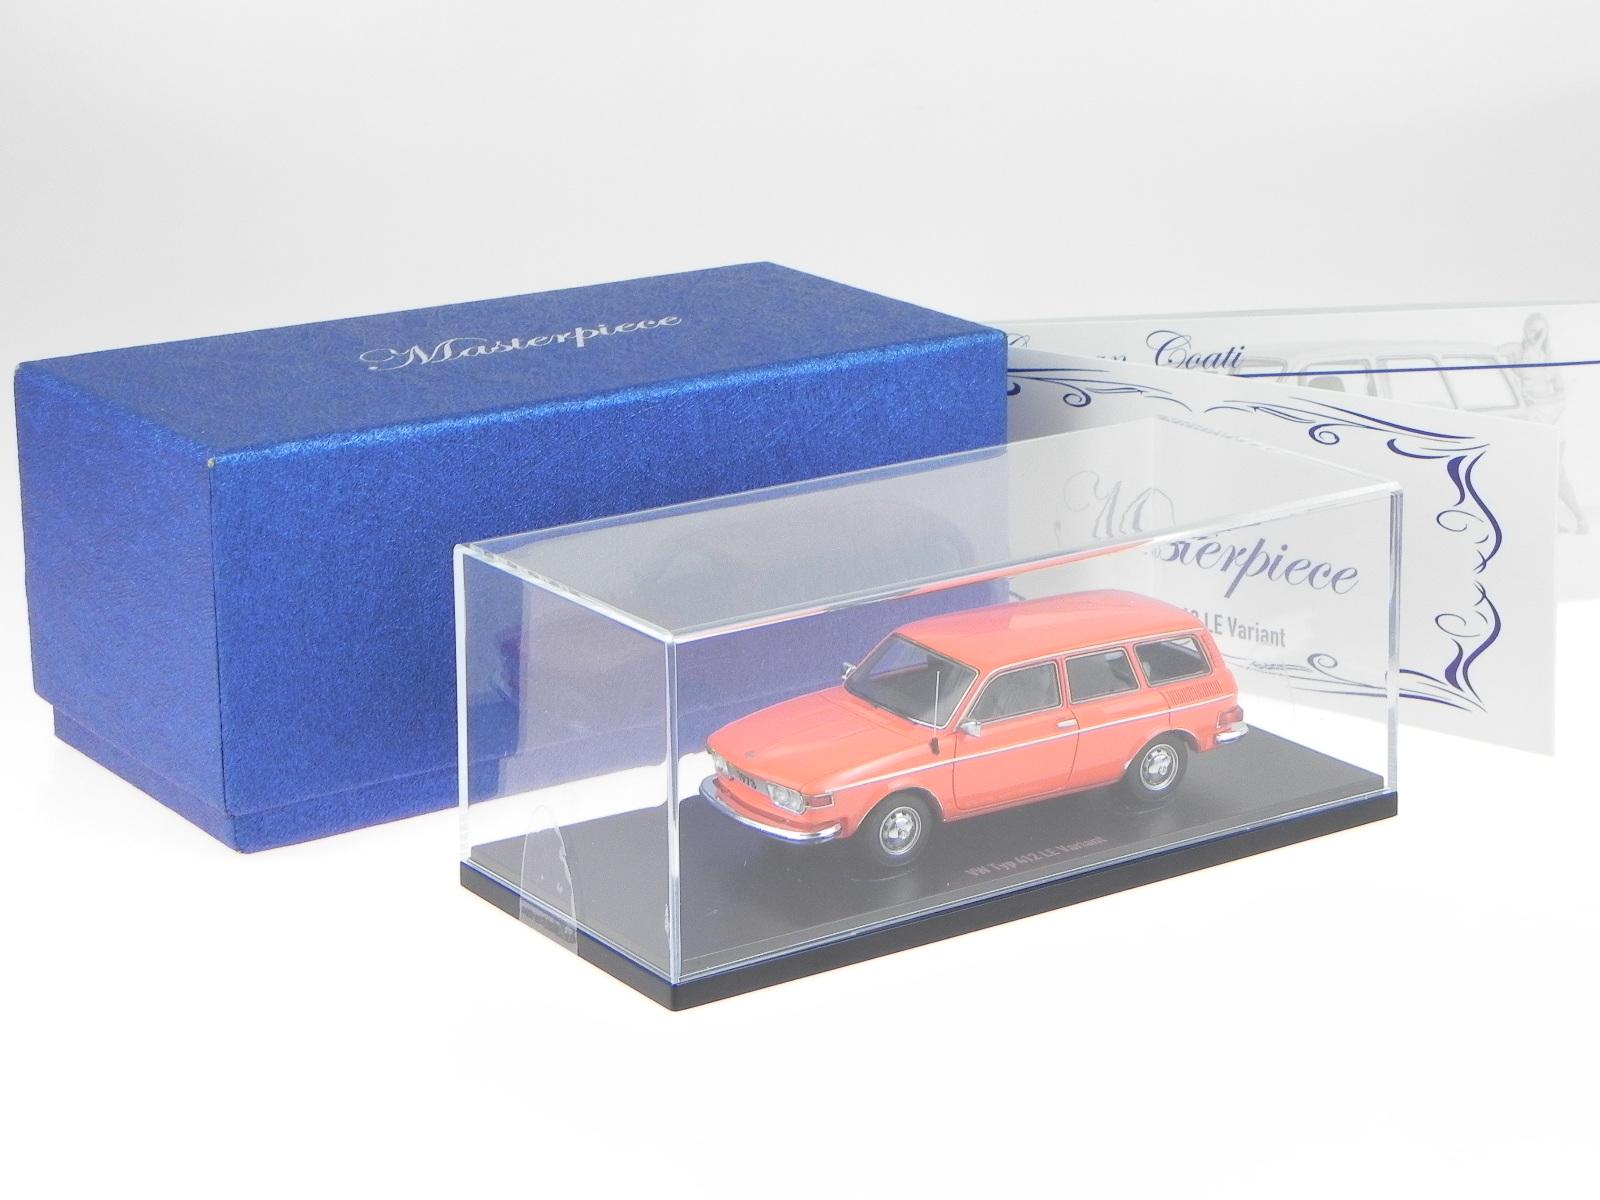 VW 412 LE Variant arancio modellino resina 90047 AutoCult 1:43 1:43 1:43 352595